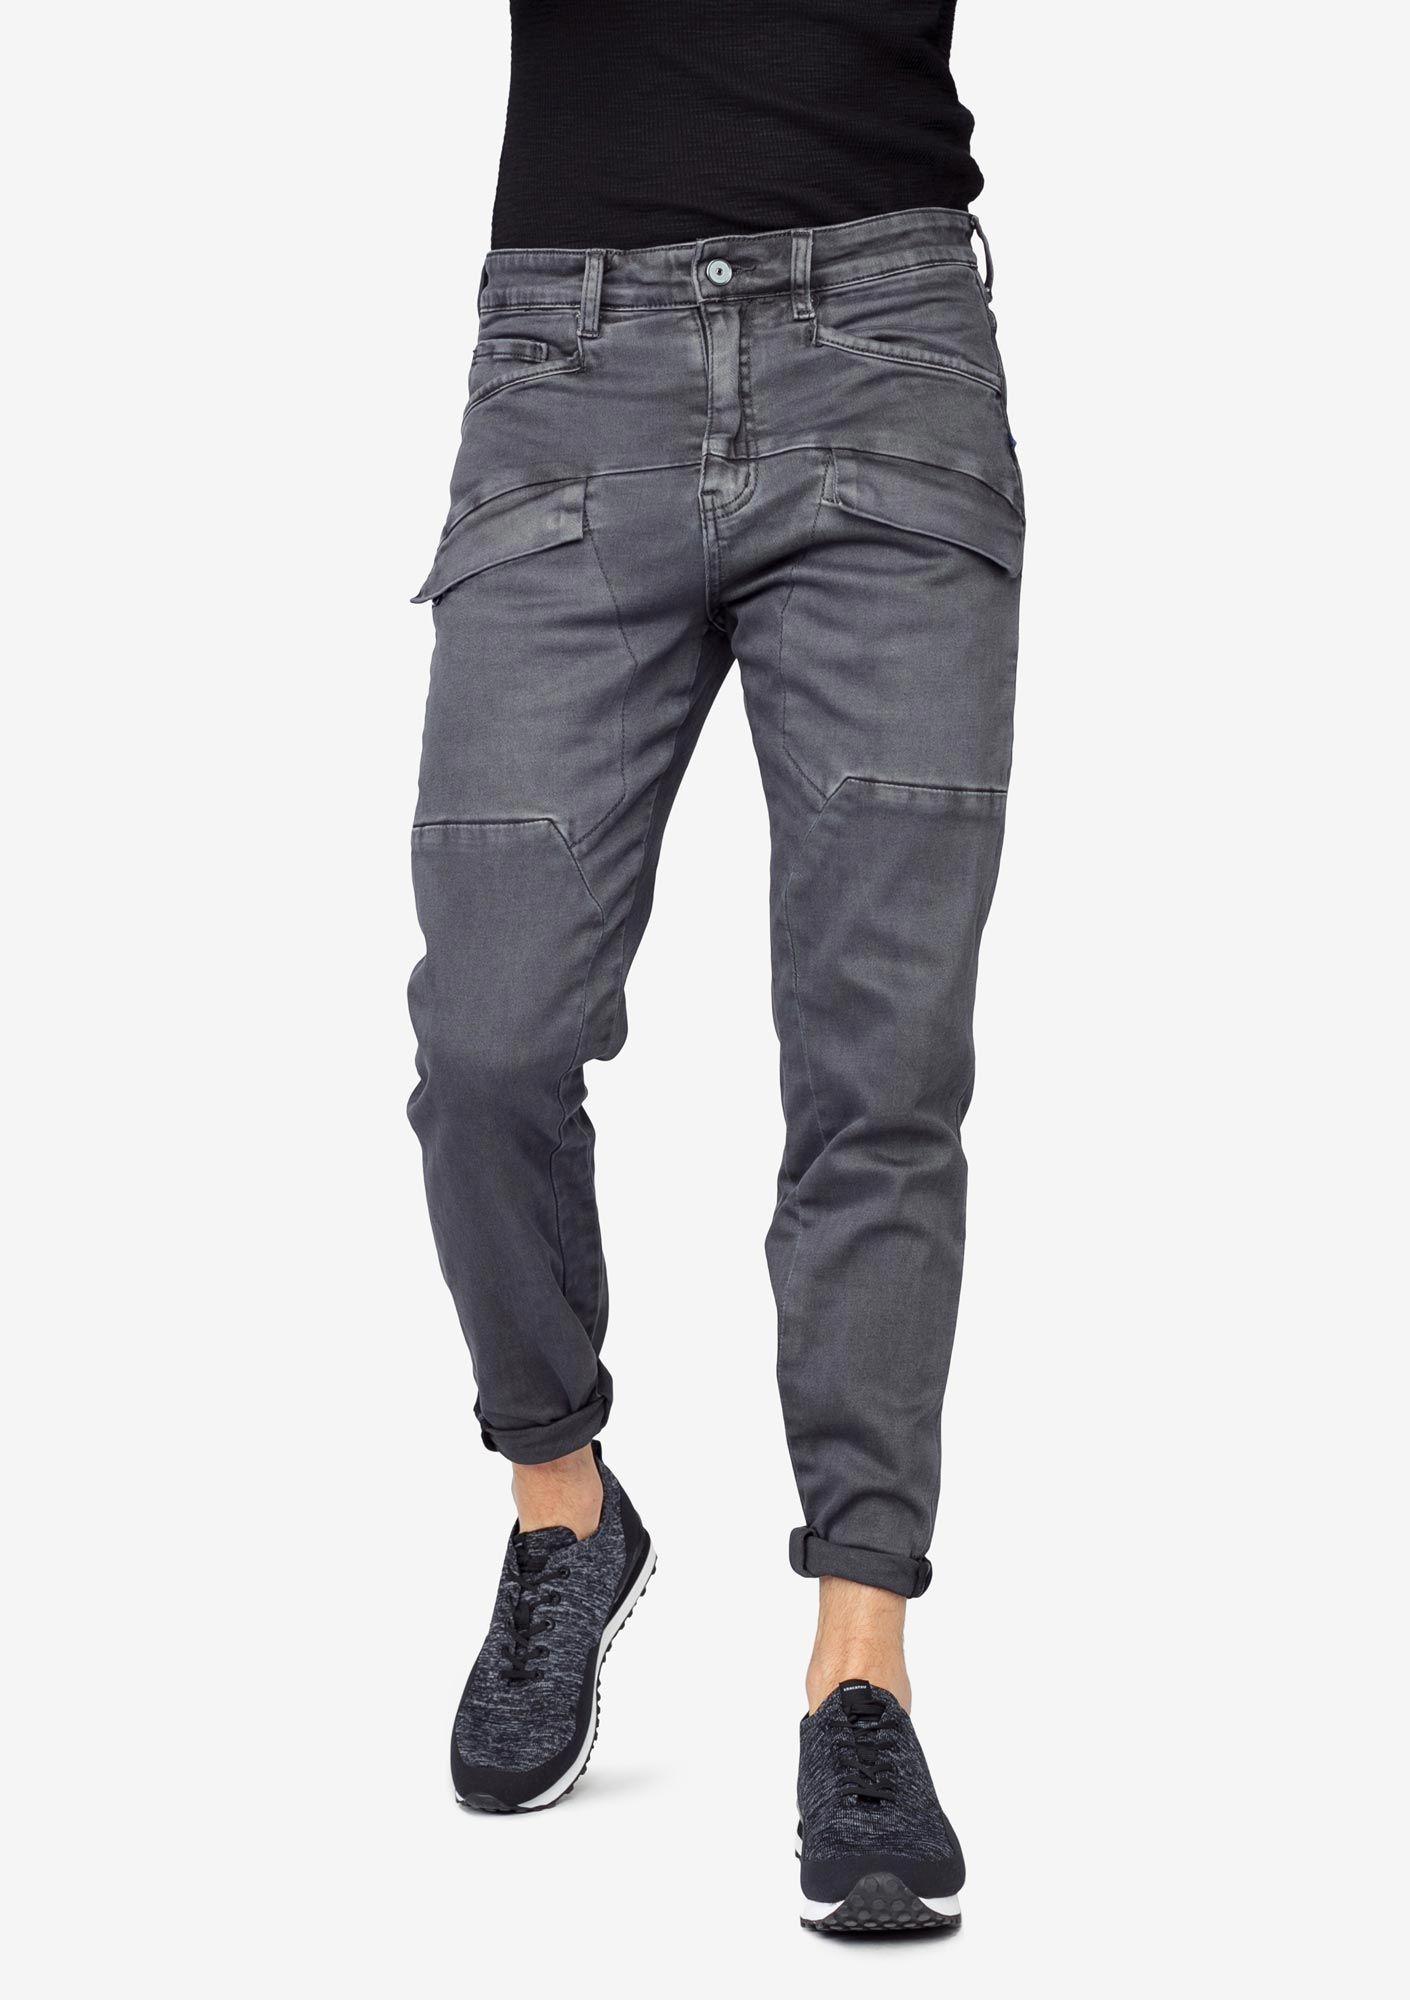 2e71f761 Krakatau jeans, techwear.   Clothes in 2019   Clothes, Street wear, Grey